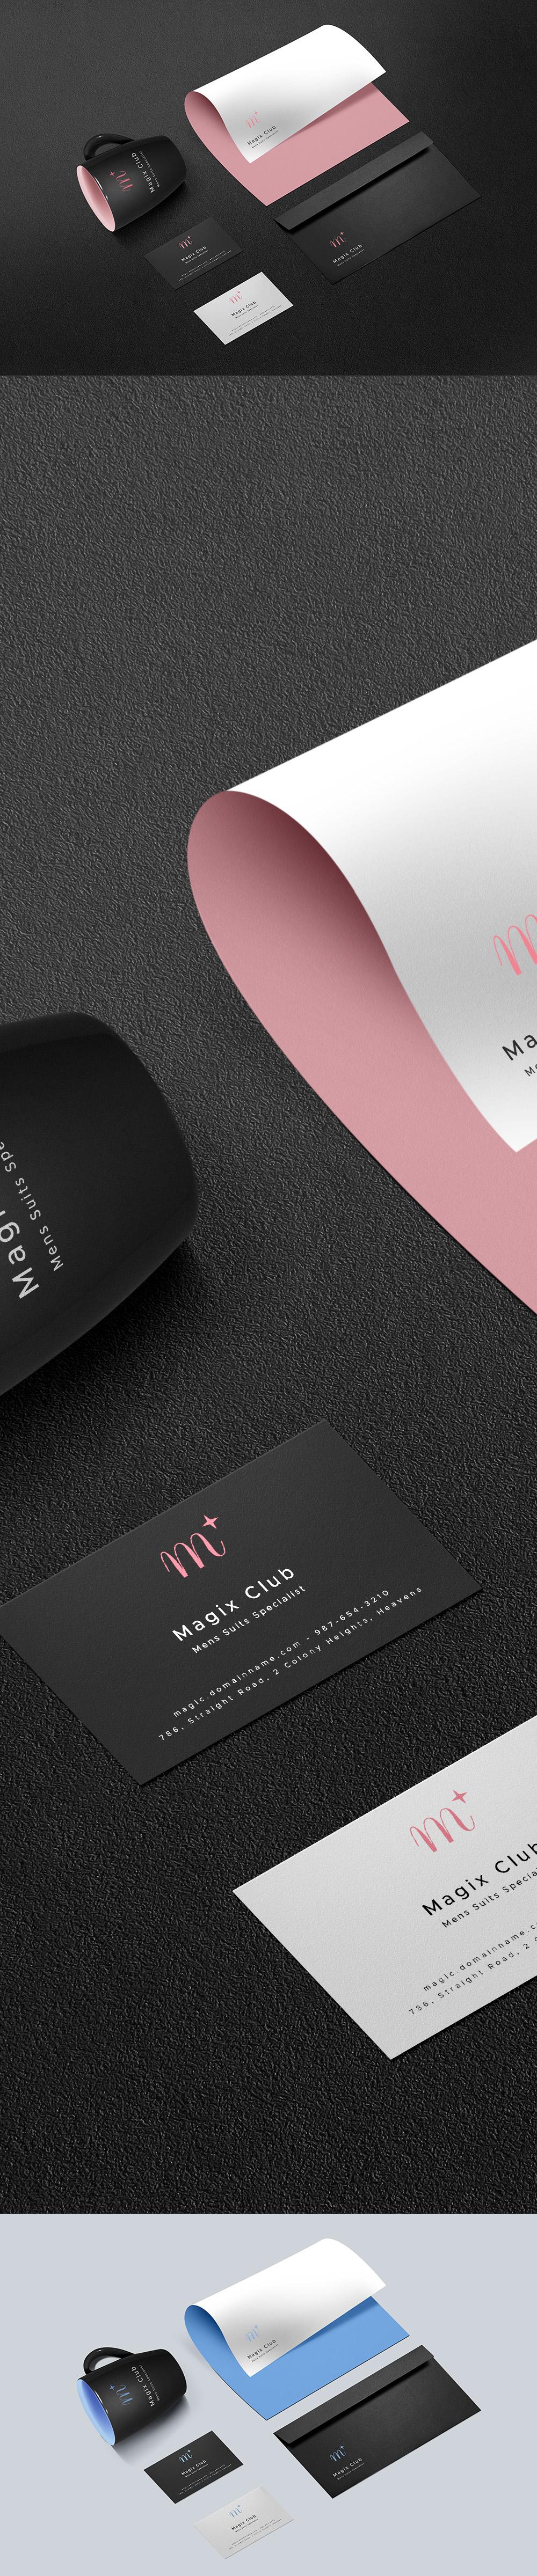 Dark Branding Identity